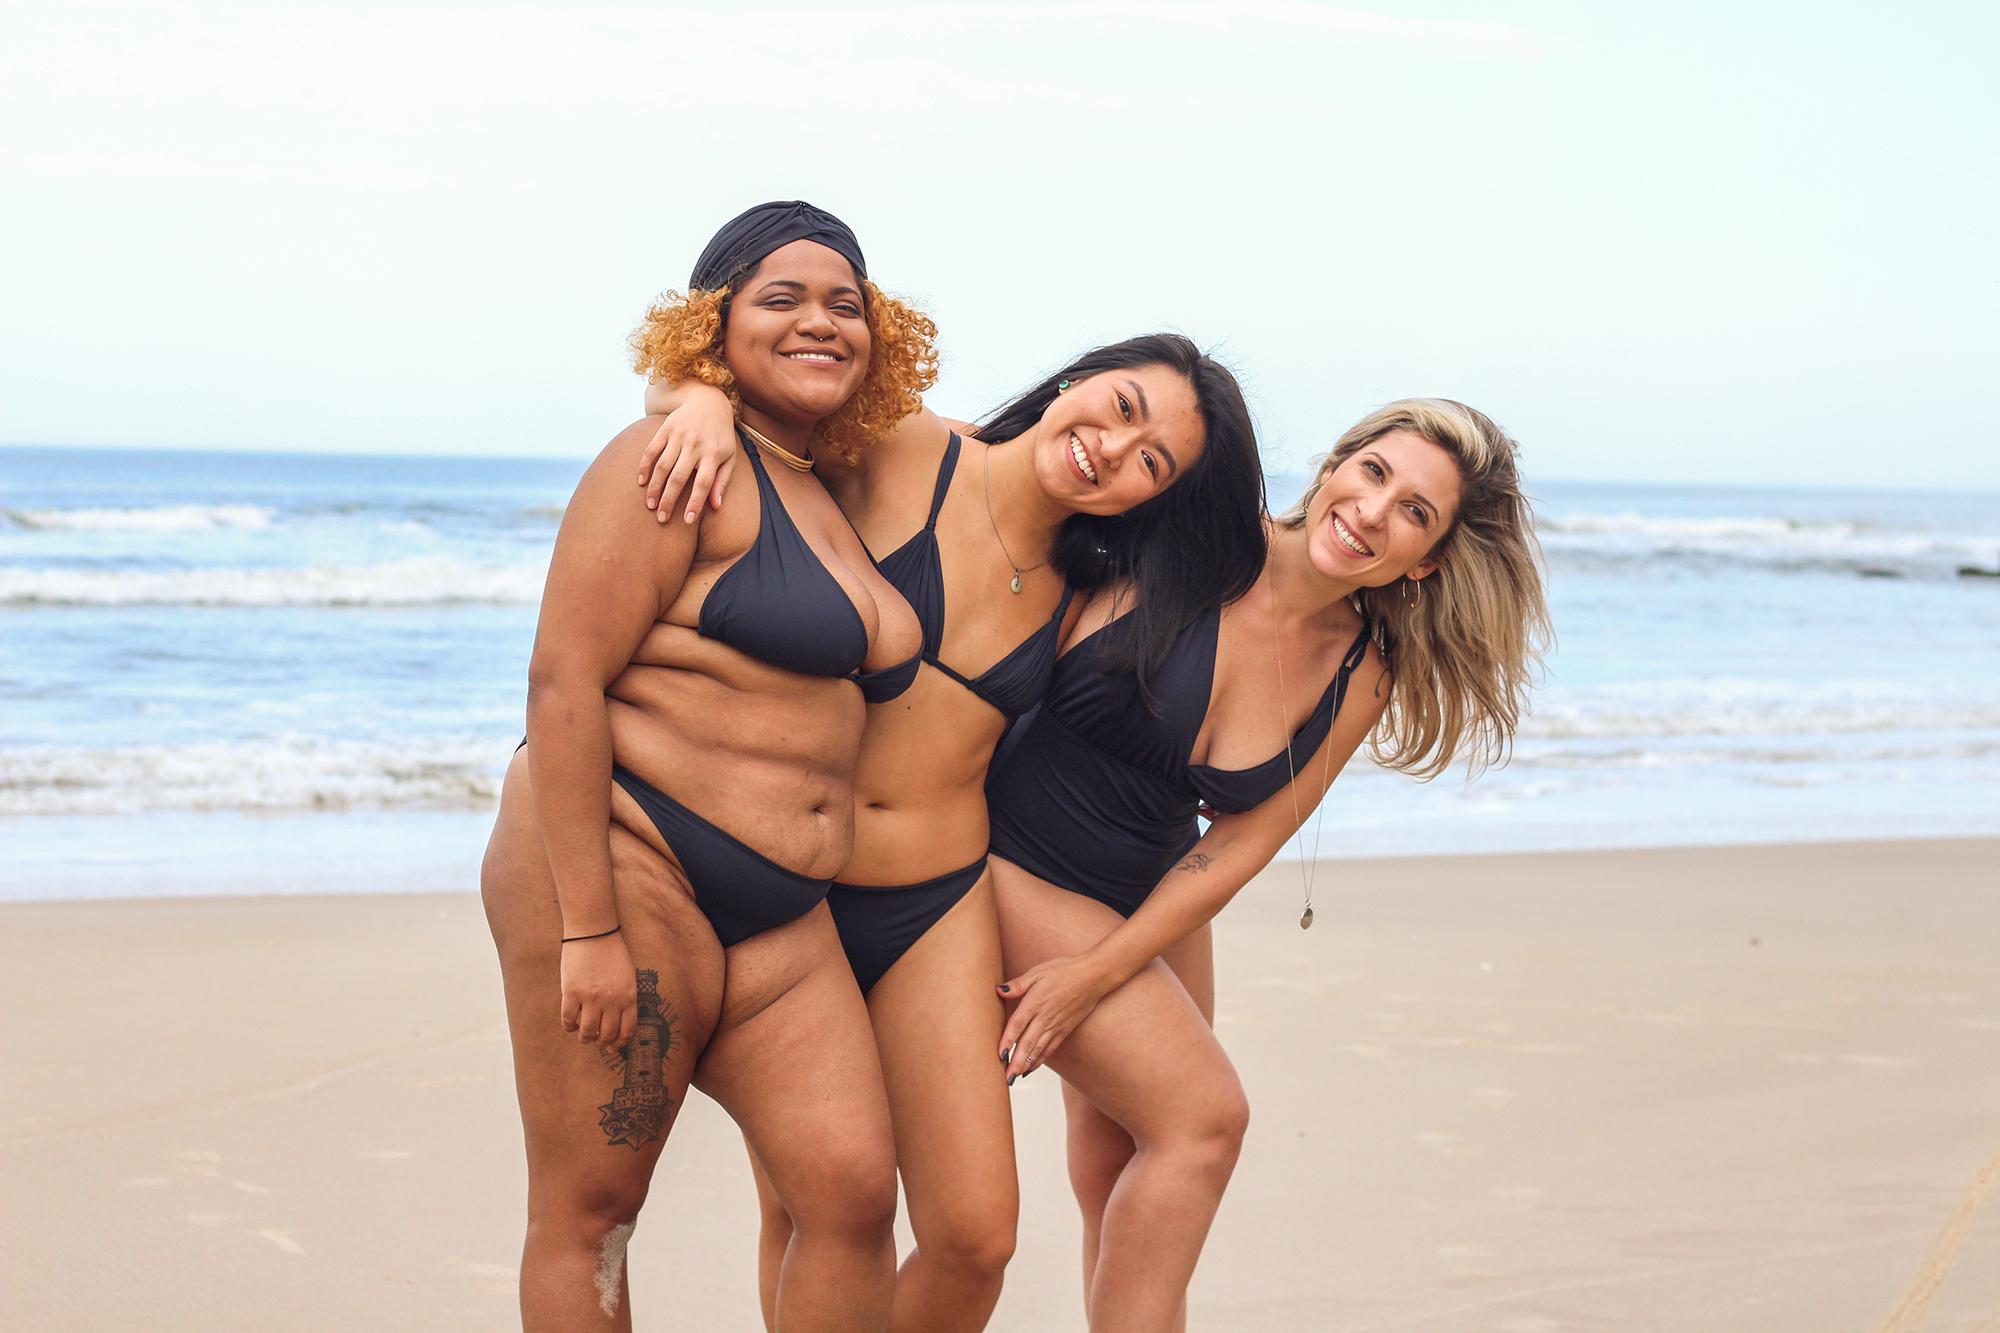 biquinis-absorventes-brasil-herself